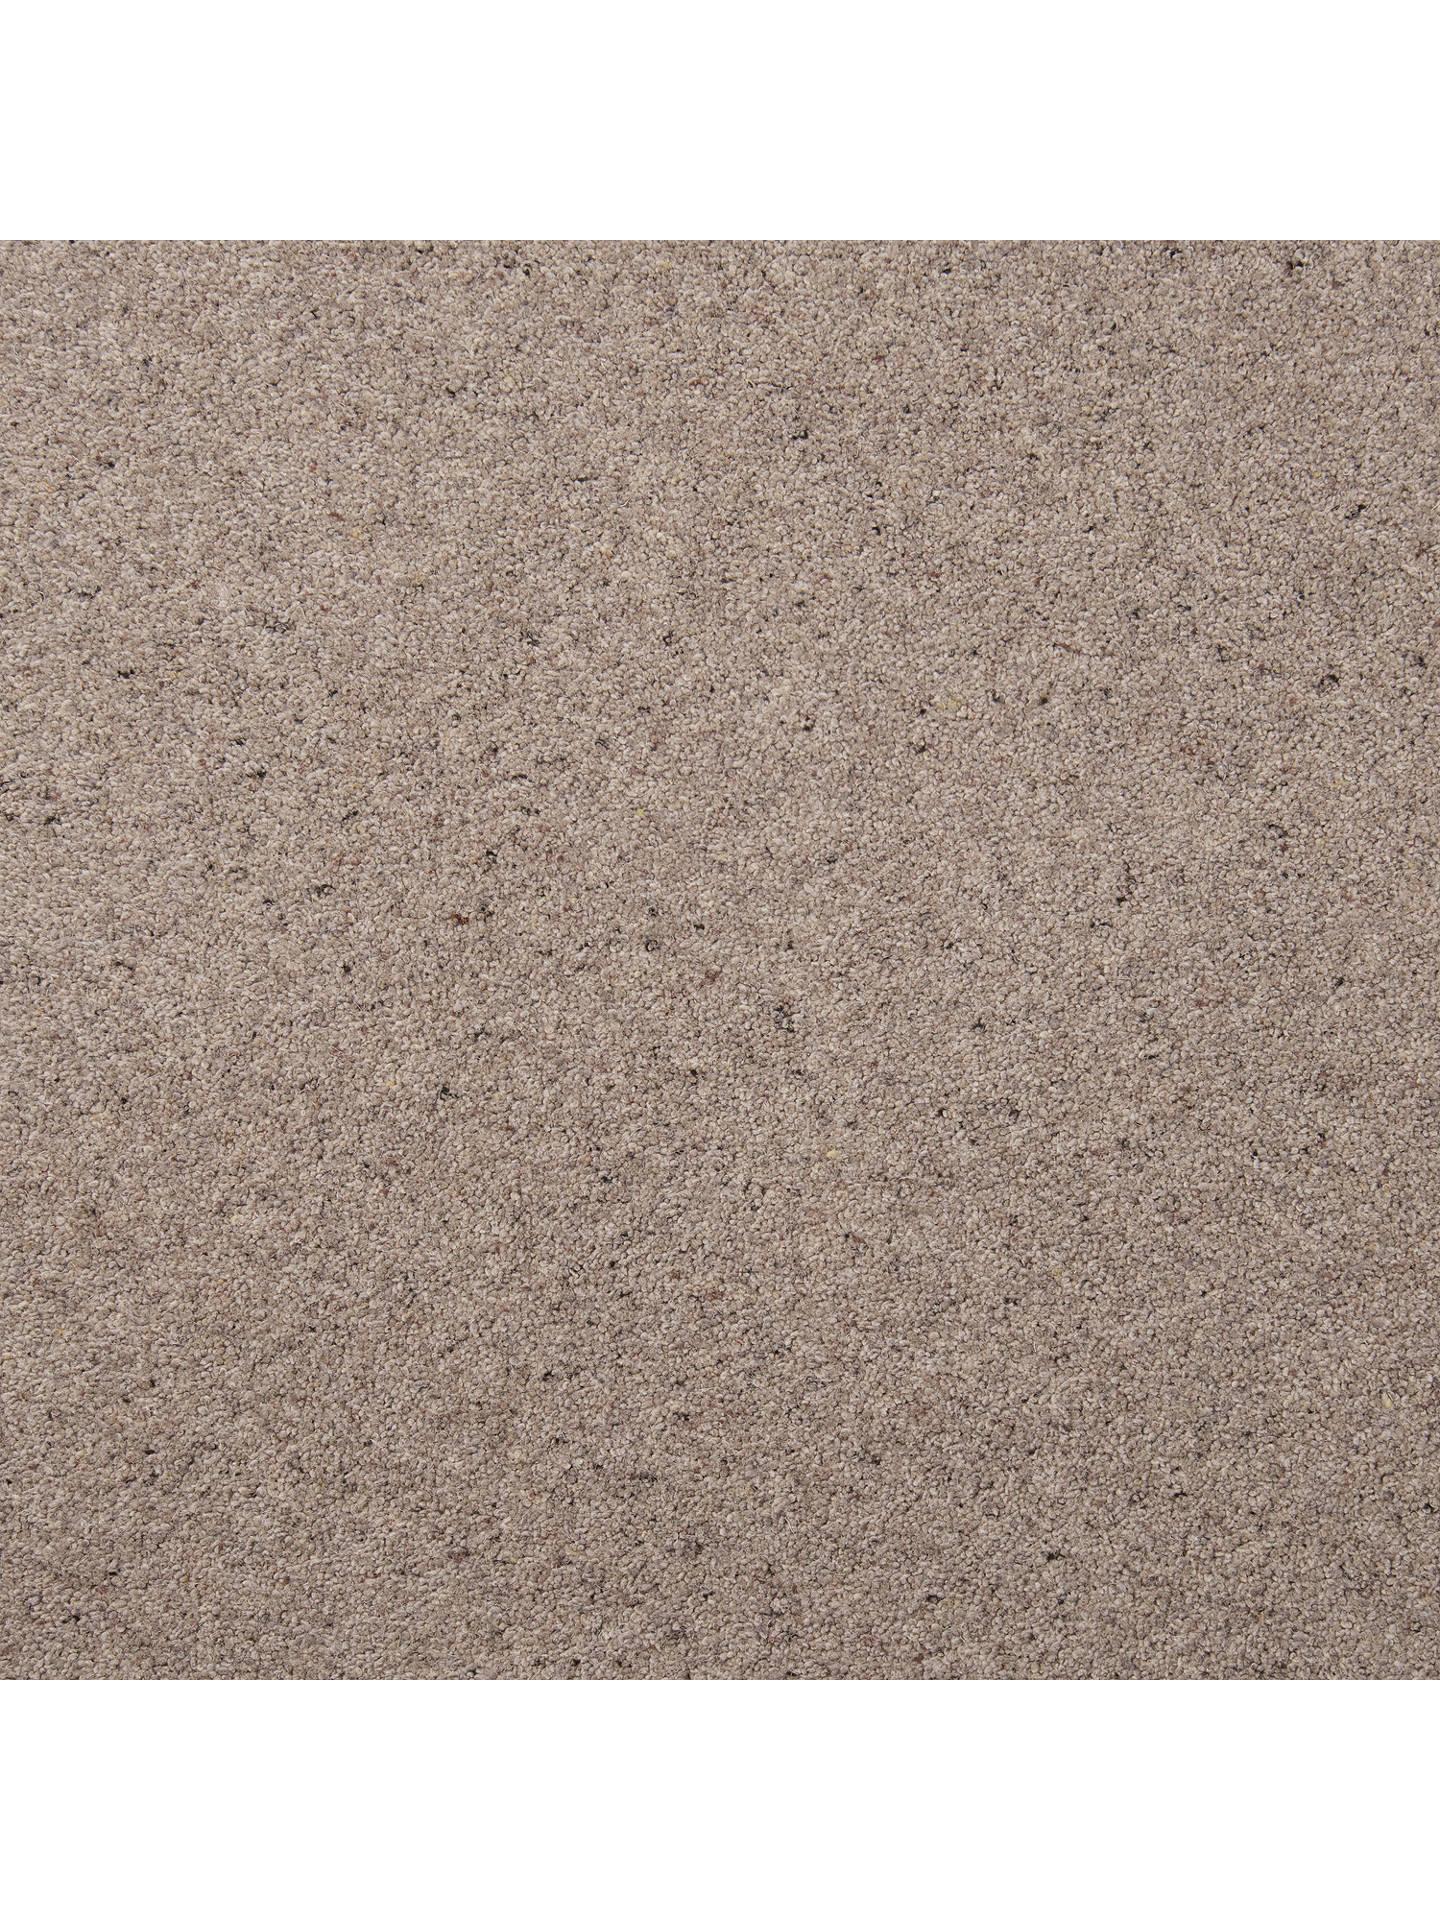 john lewis partners wool rich flecked 45oz twist carpet. Black Bedroom Furniture Sets. Home Design Ideas